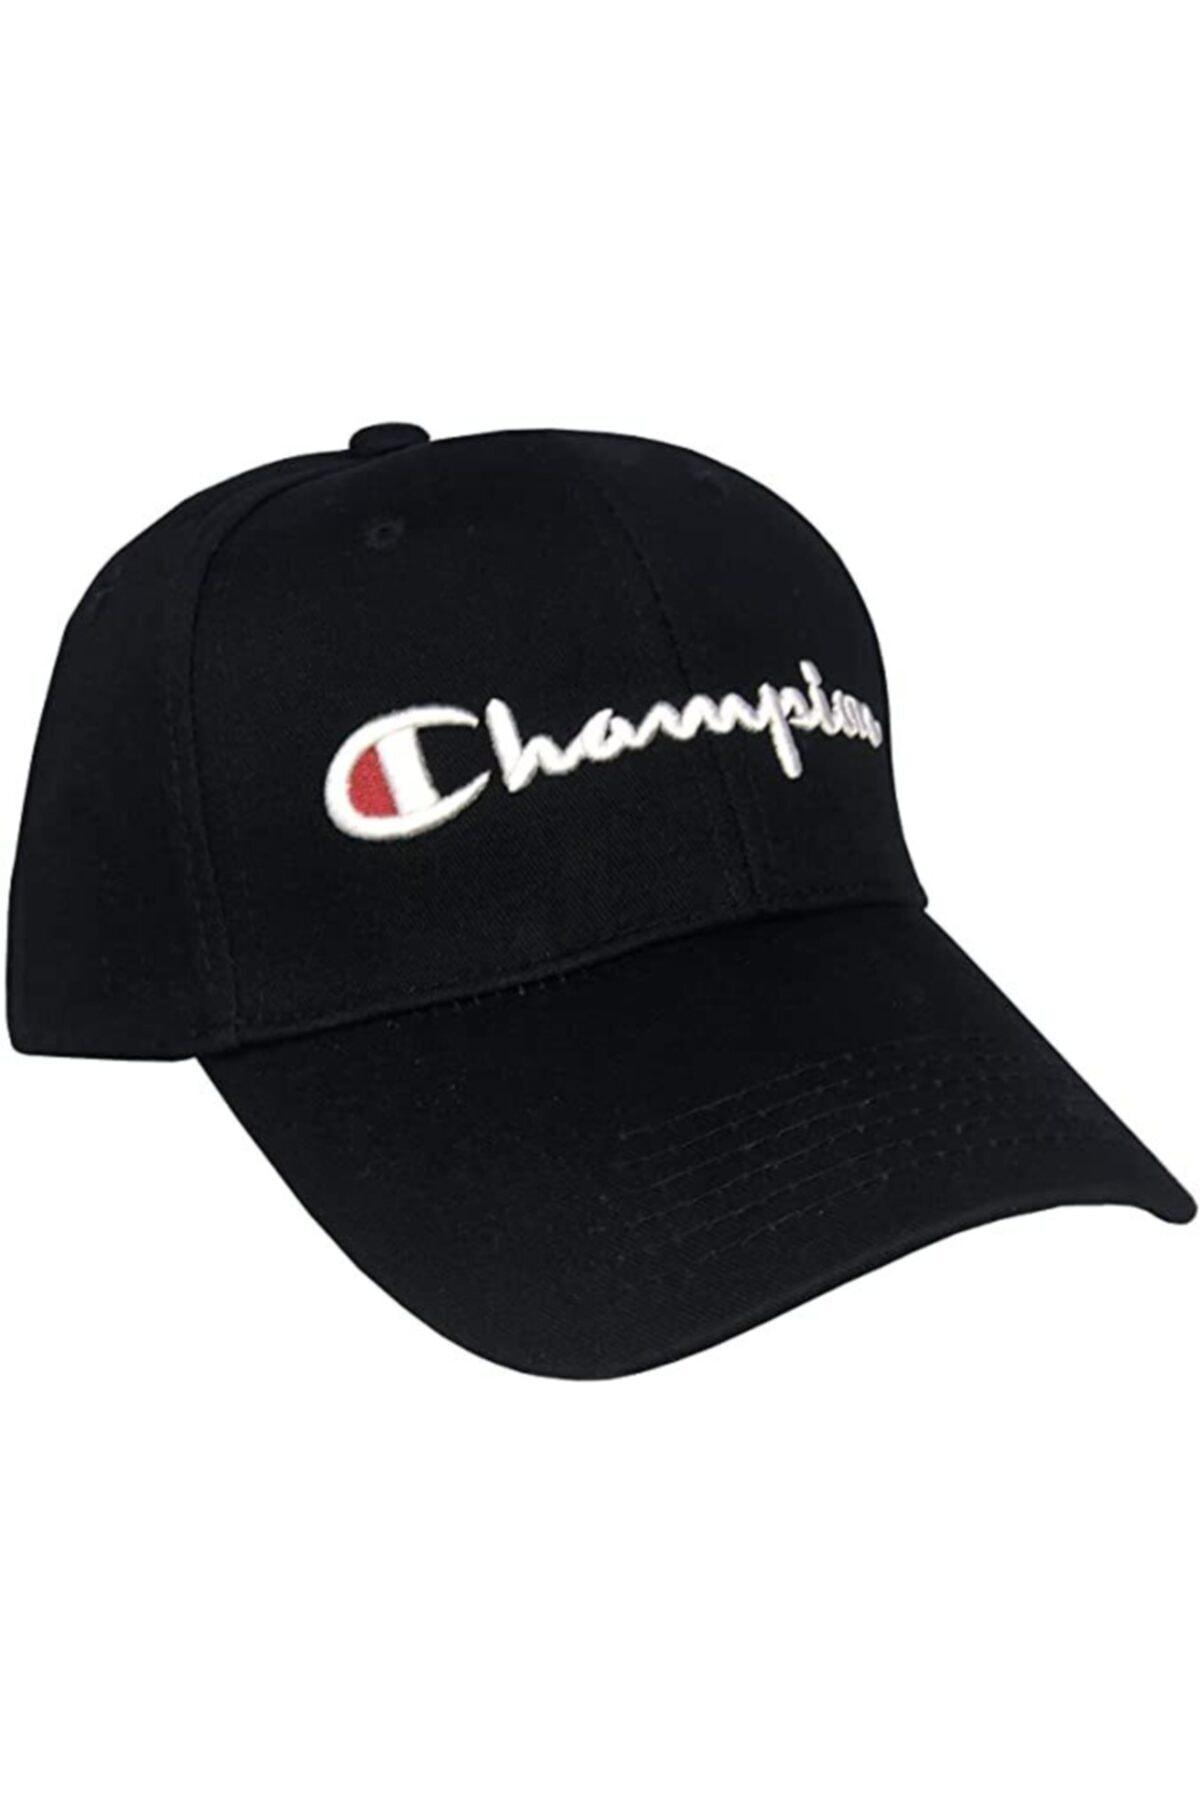 Champ Kep